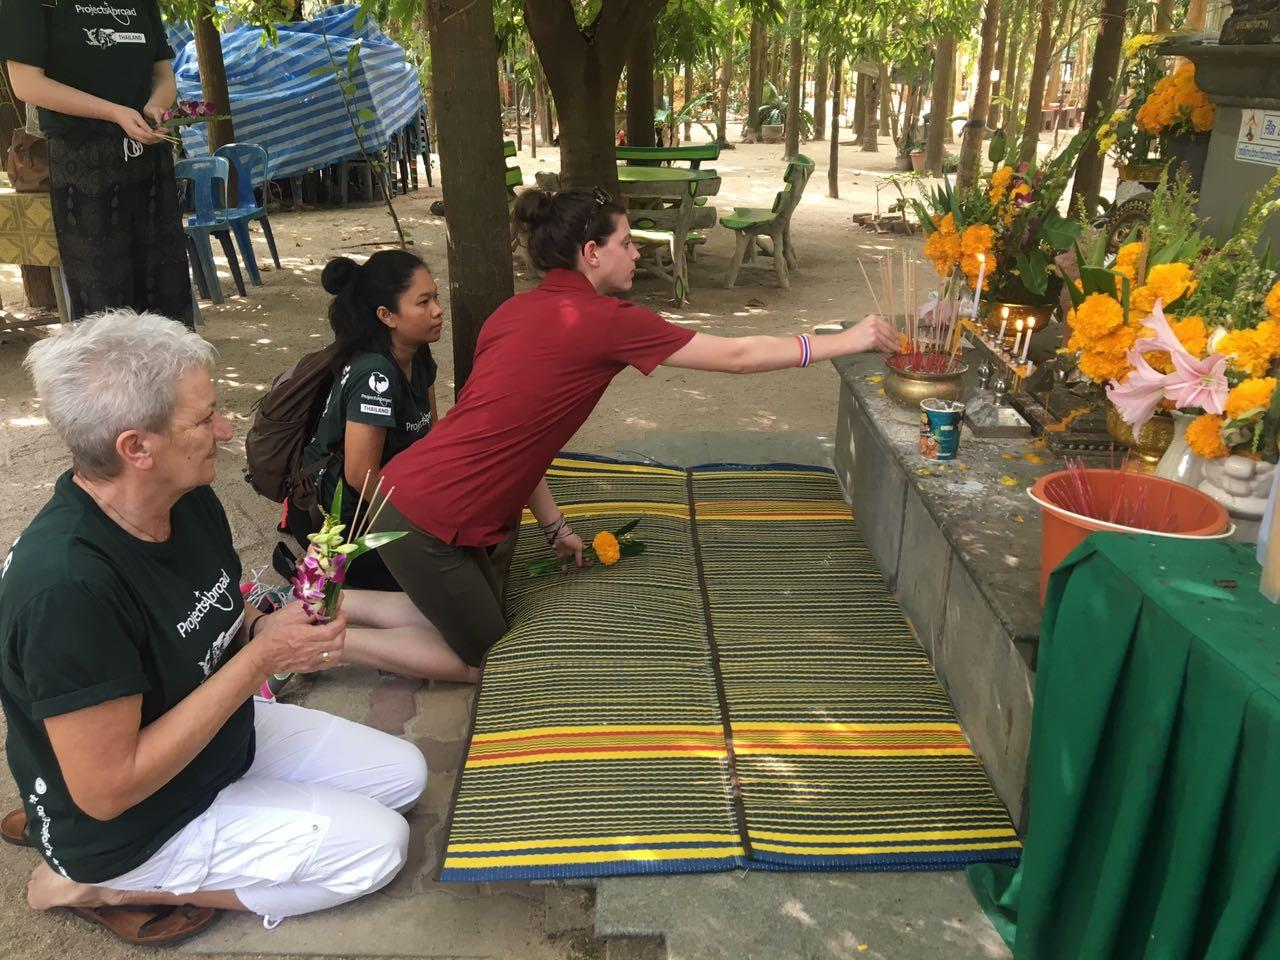 Freiwilligenarbeit in Thailand Generation 50 plus - Special